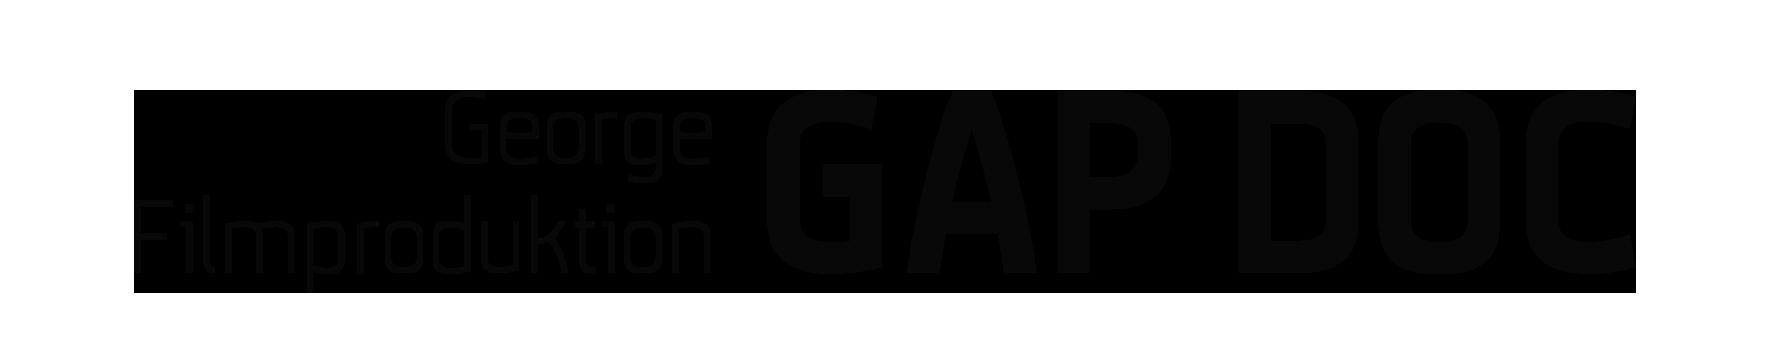 GapDoc -